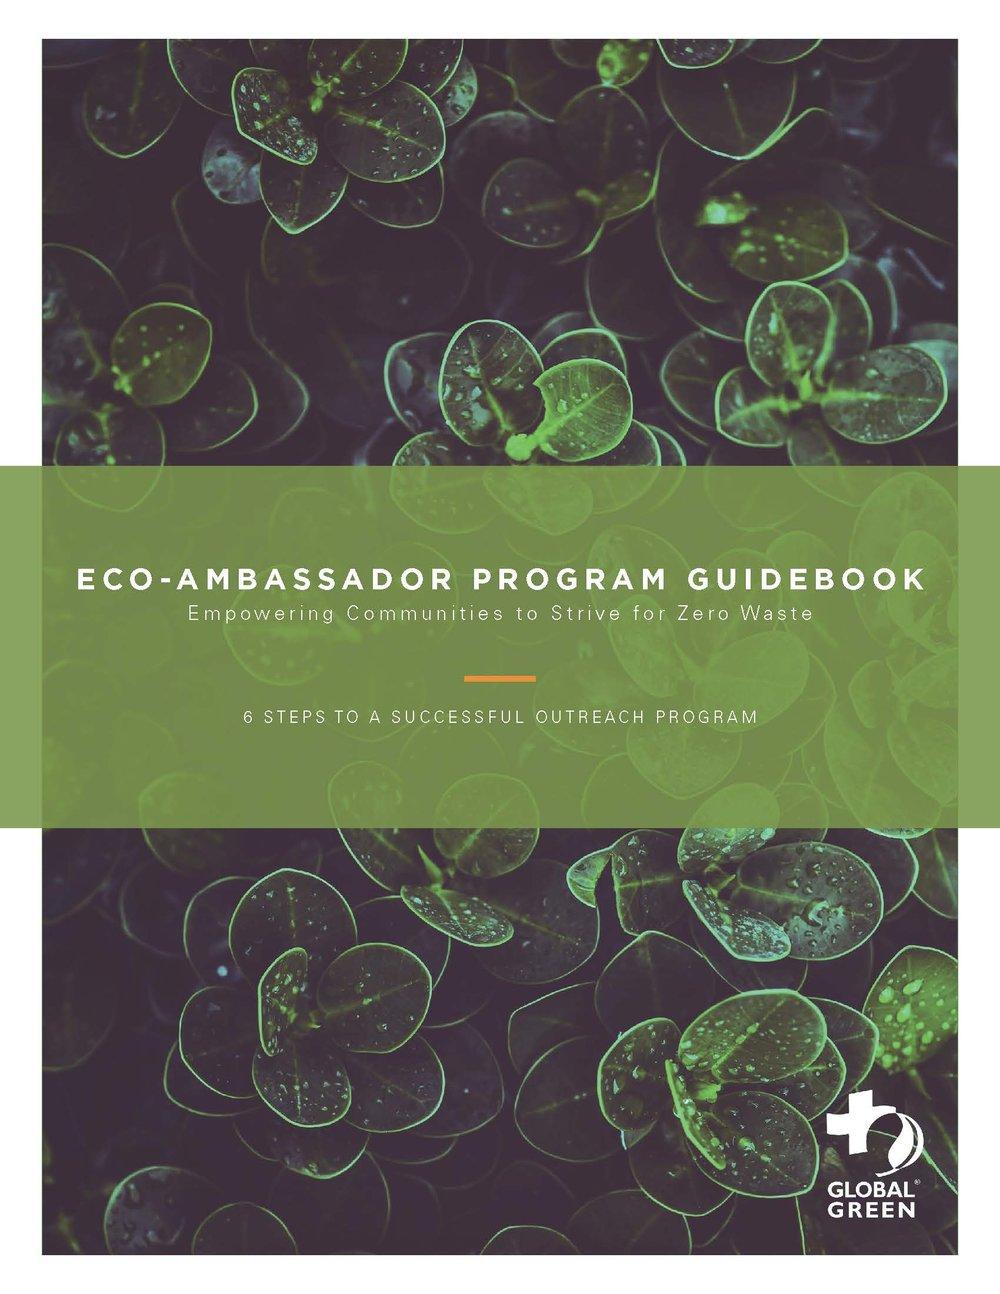 Figure 6: Eco-Ambassador Program Guidebook